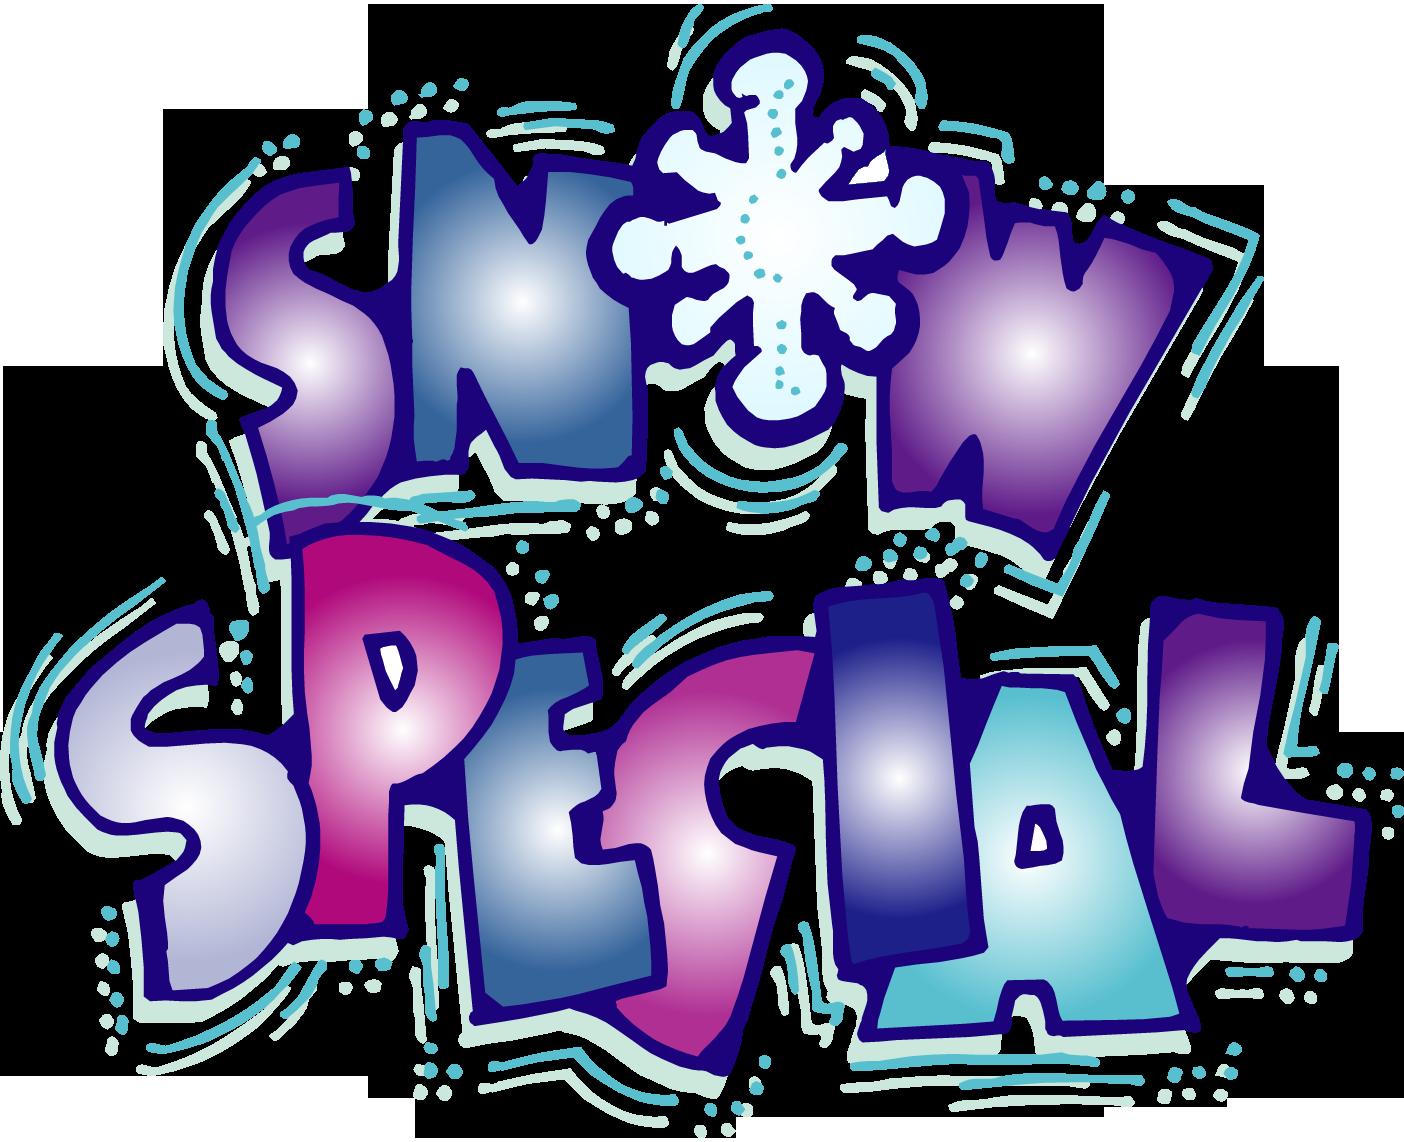 Free Winter Wonderland Clipart, Download Free Clip Art, Free.